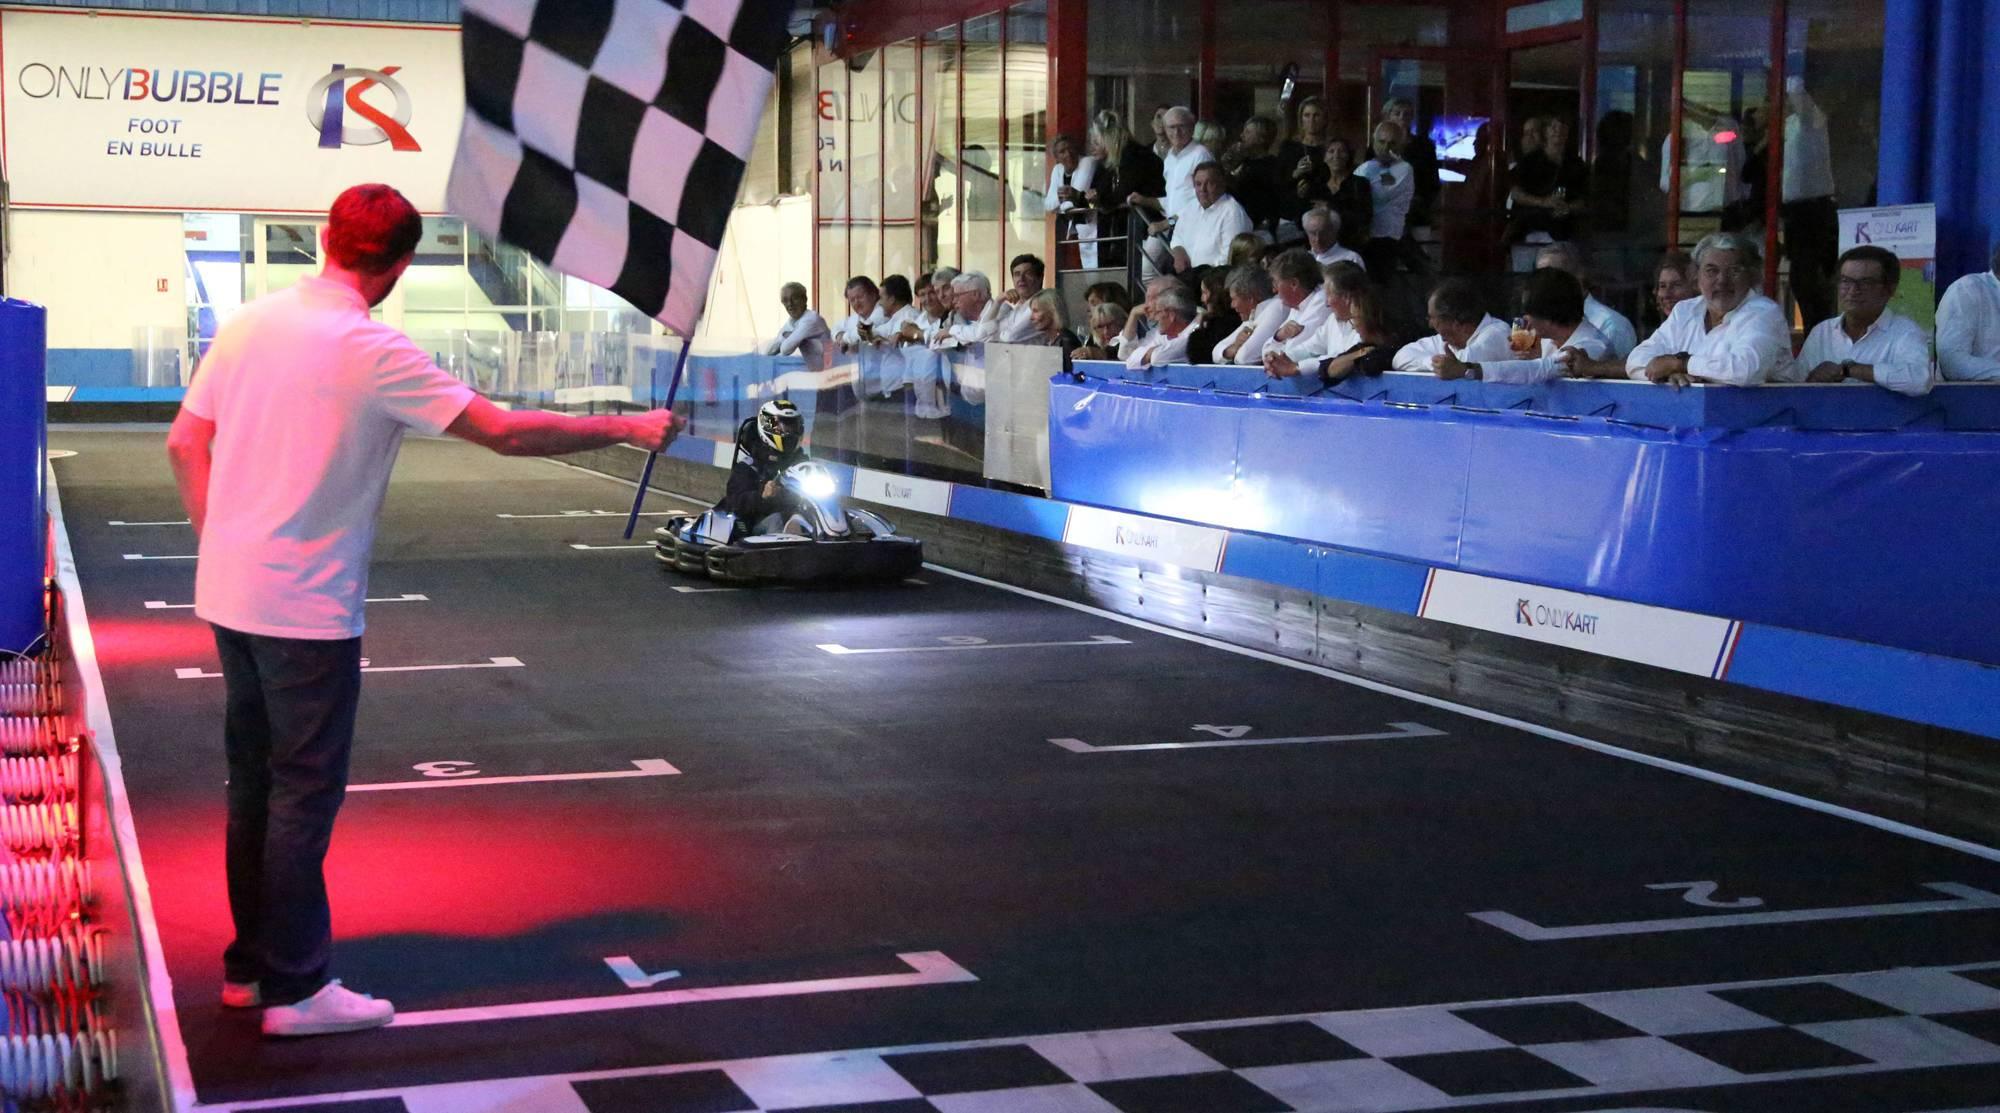 grands prix karting près de lyon